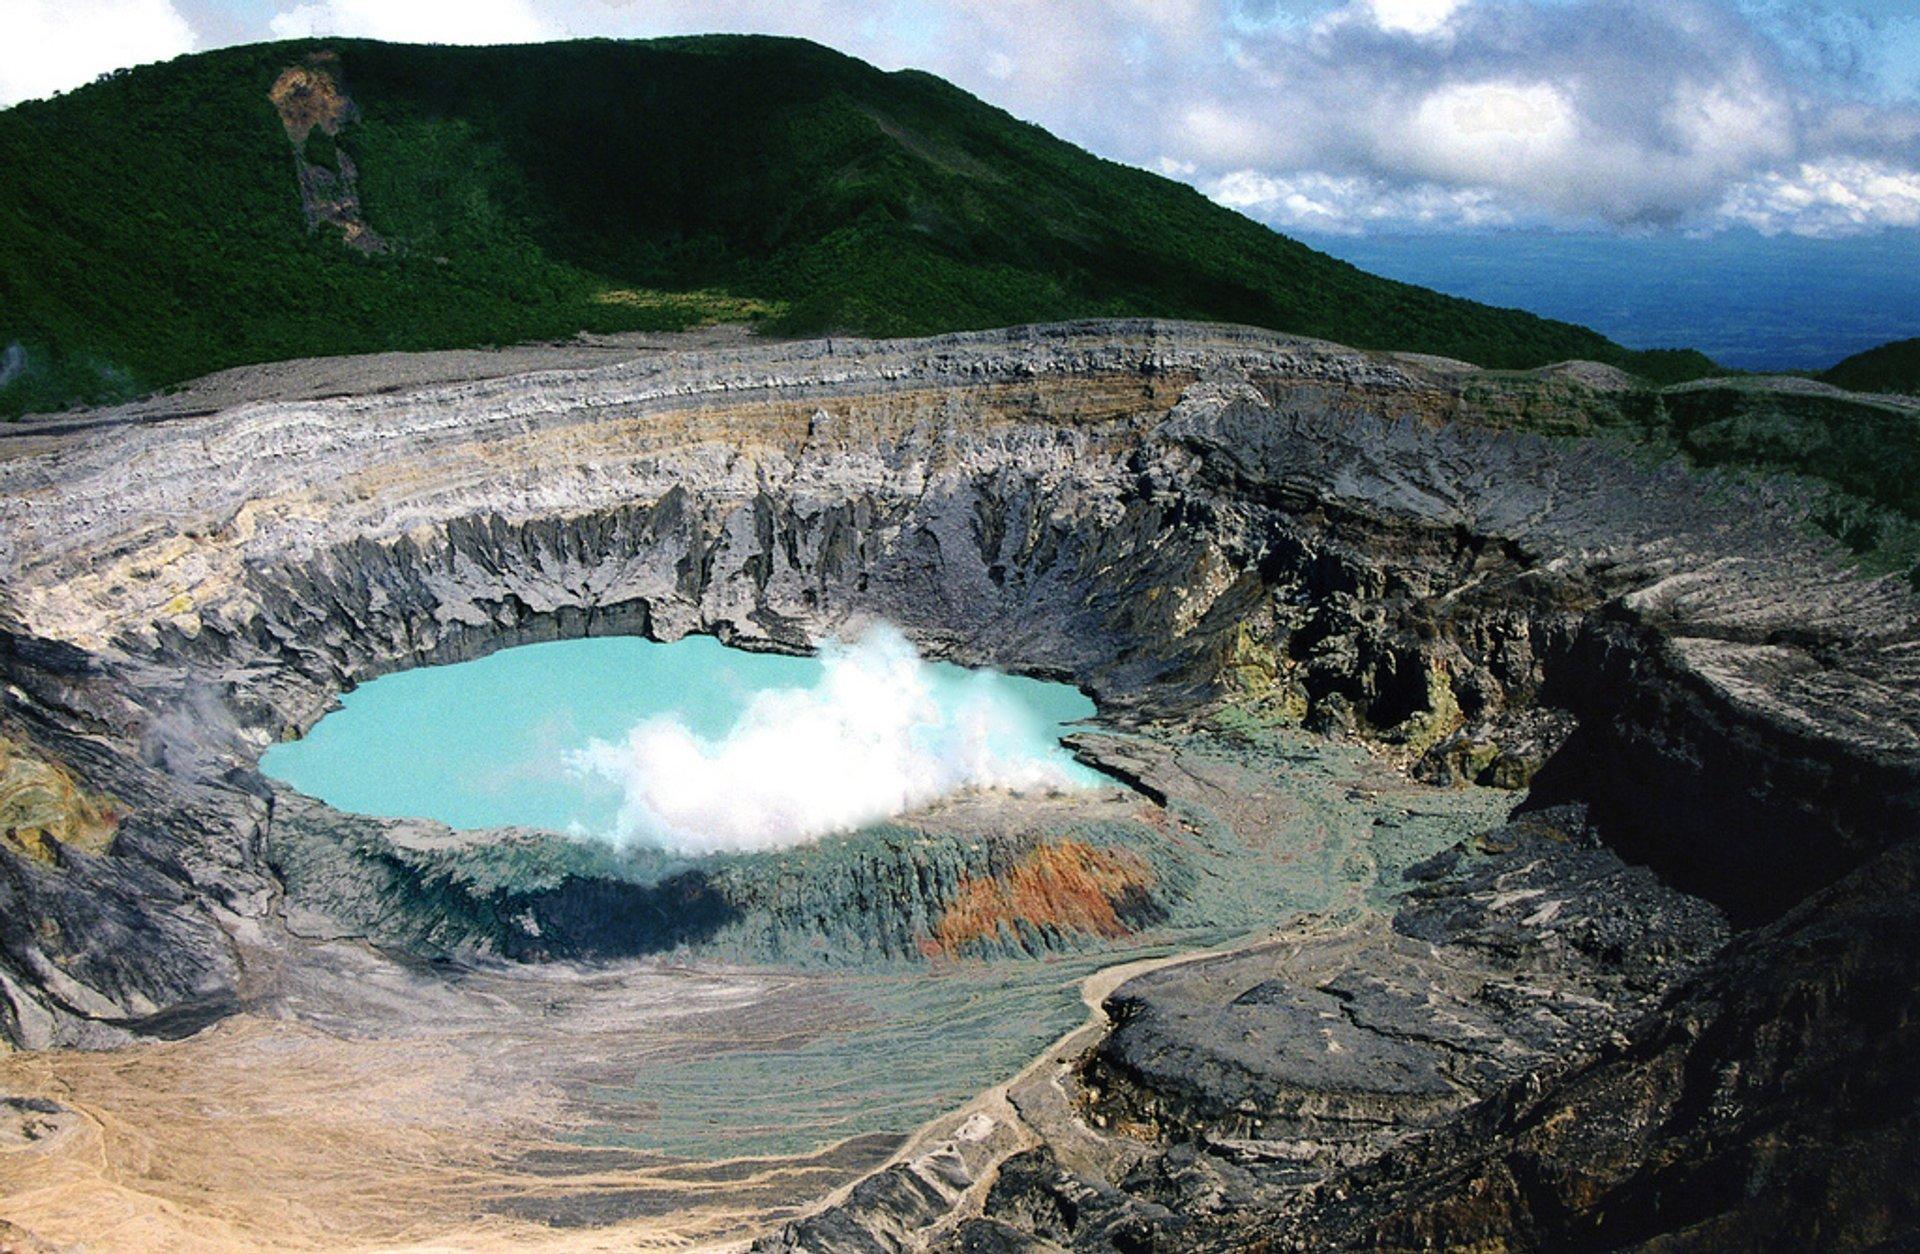 Poas Volcano in Costa Rica 2019 - Best Time